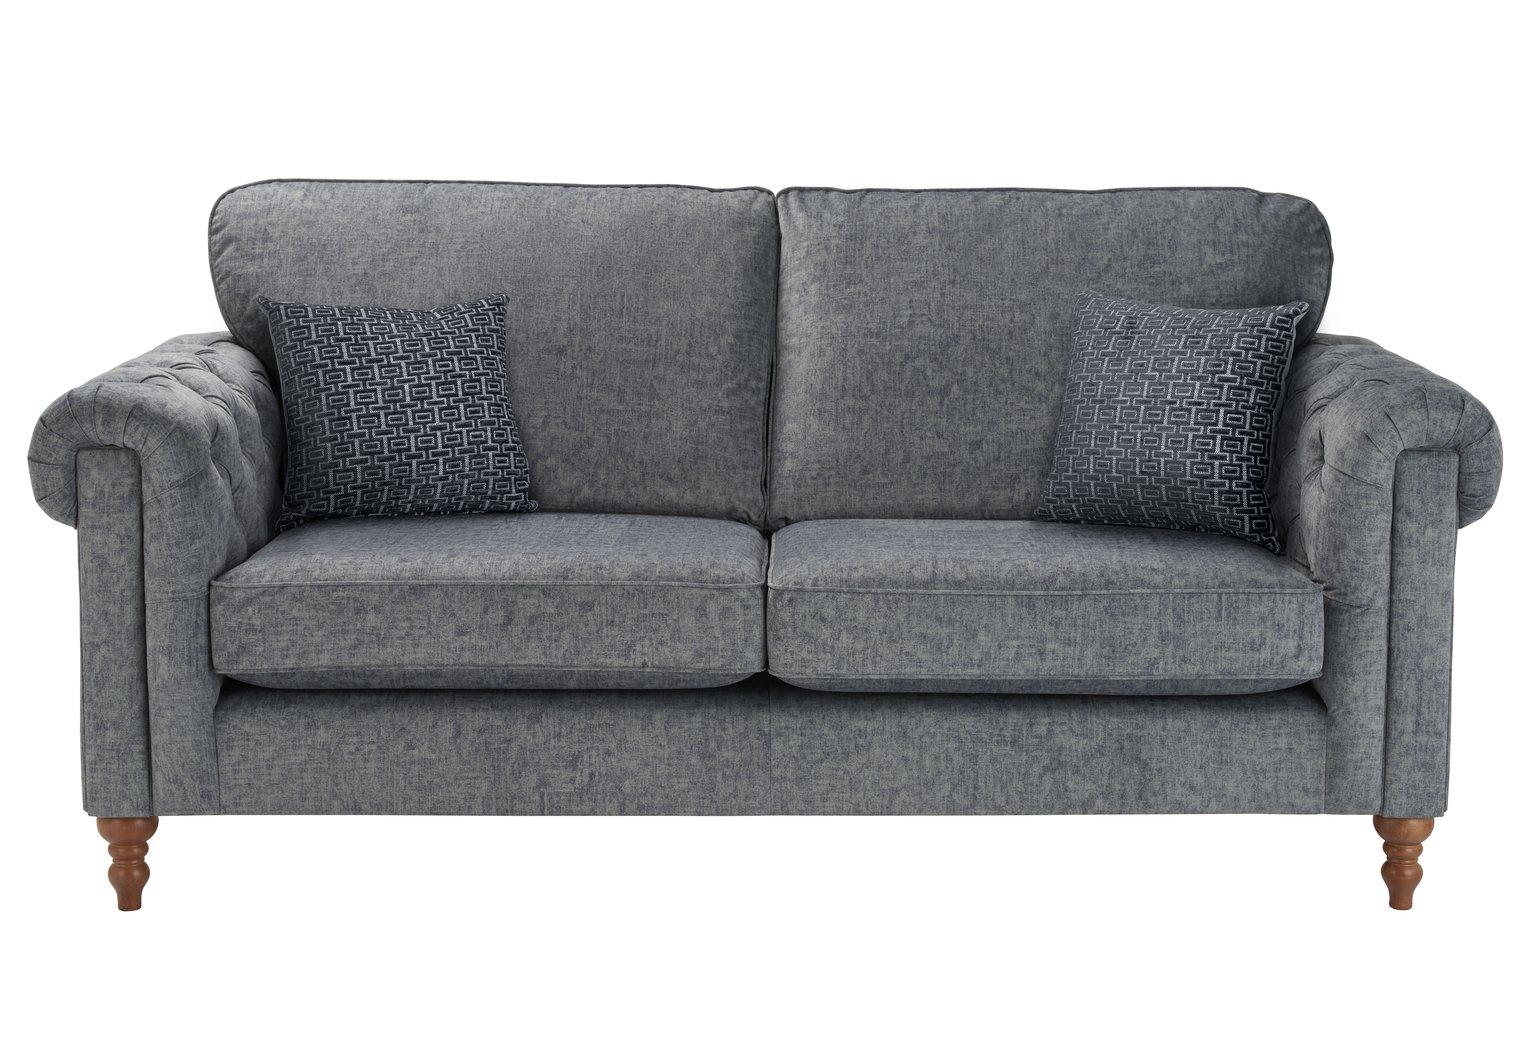 Argos Home Rebecca 3 Seater Fabric Sofa - Charcoal